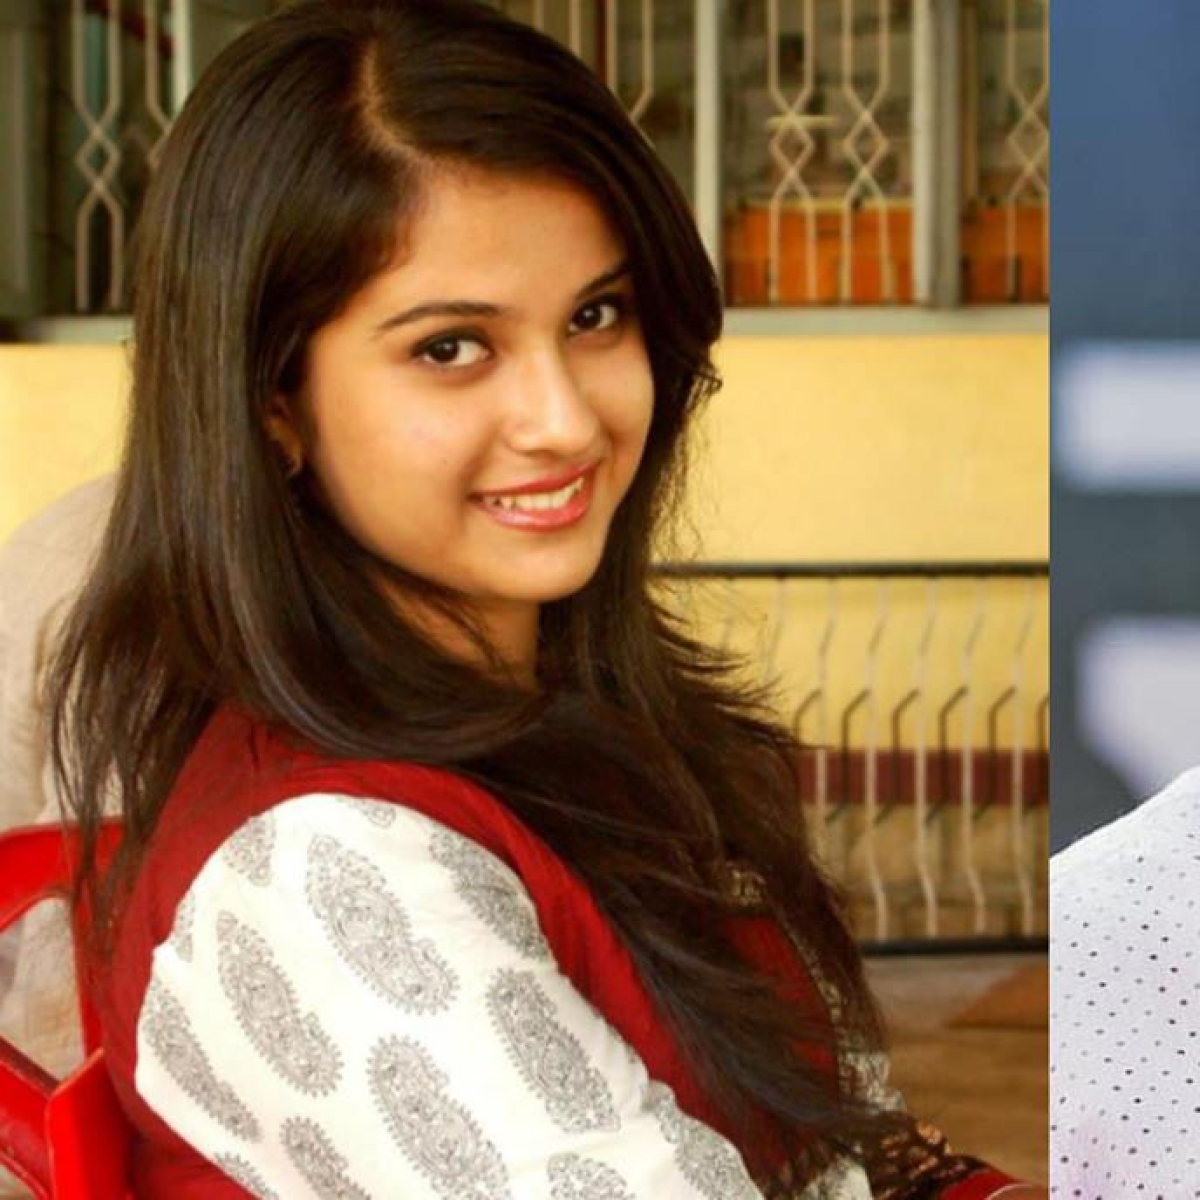 Will spill 'secrets' to CBI if Disha Salian's BF Rohan doesn't come forward: BJP MLA Nitesh Rane